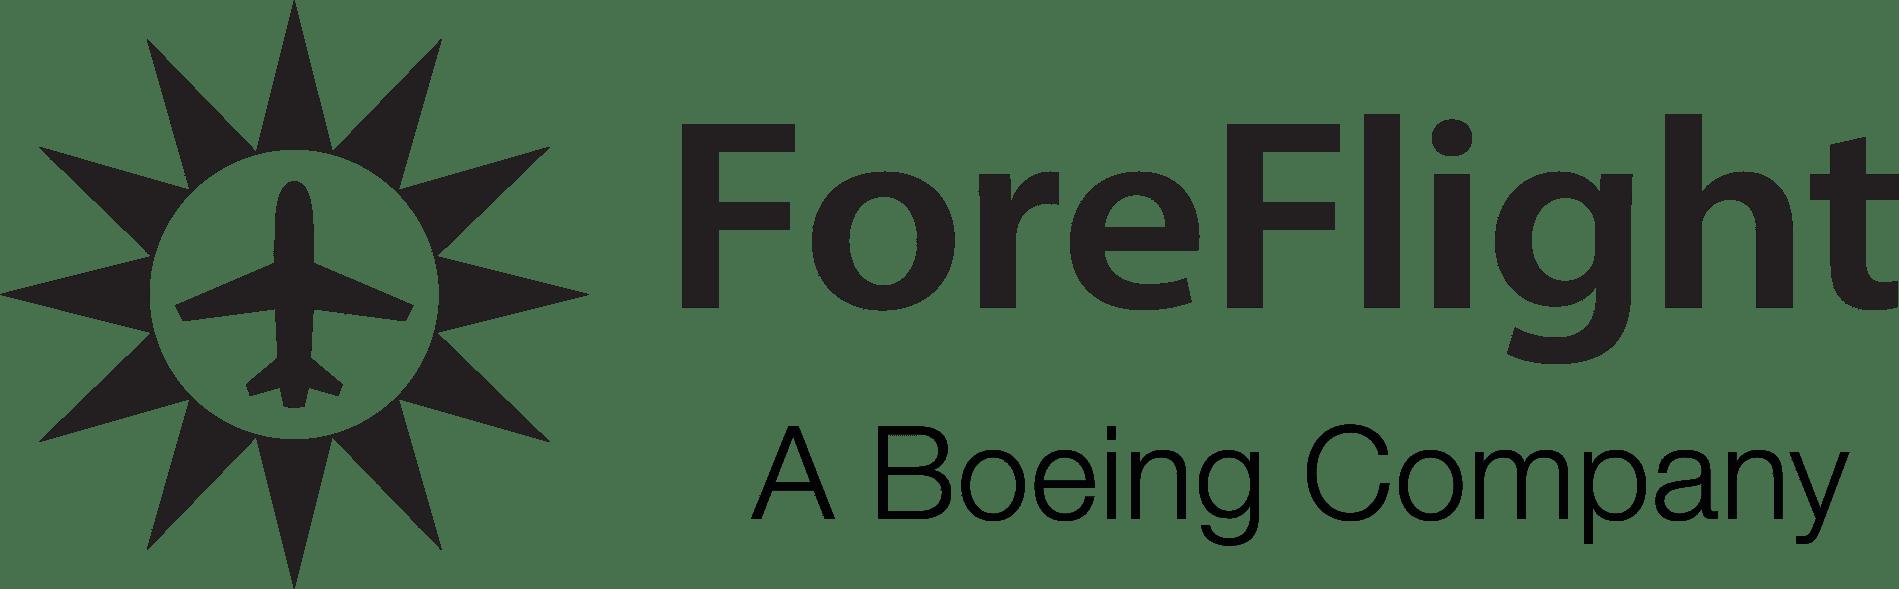 ForeFlight logo